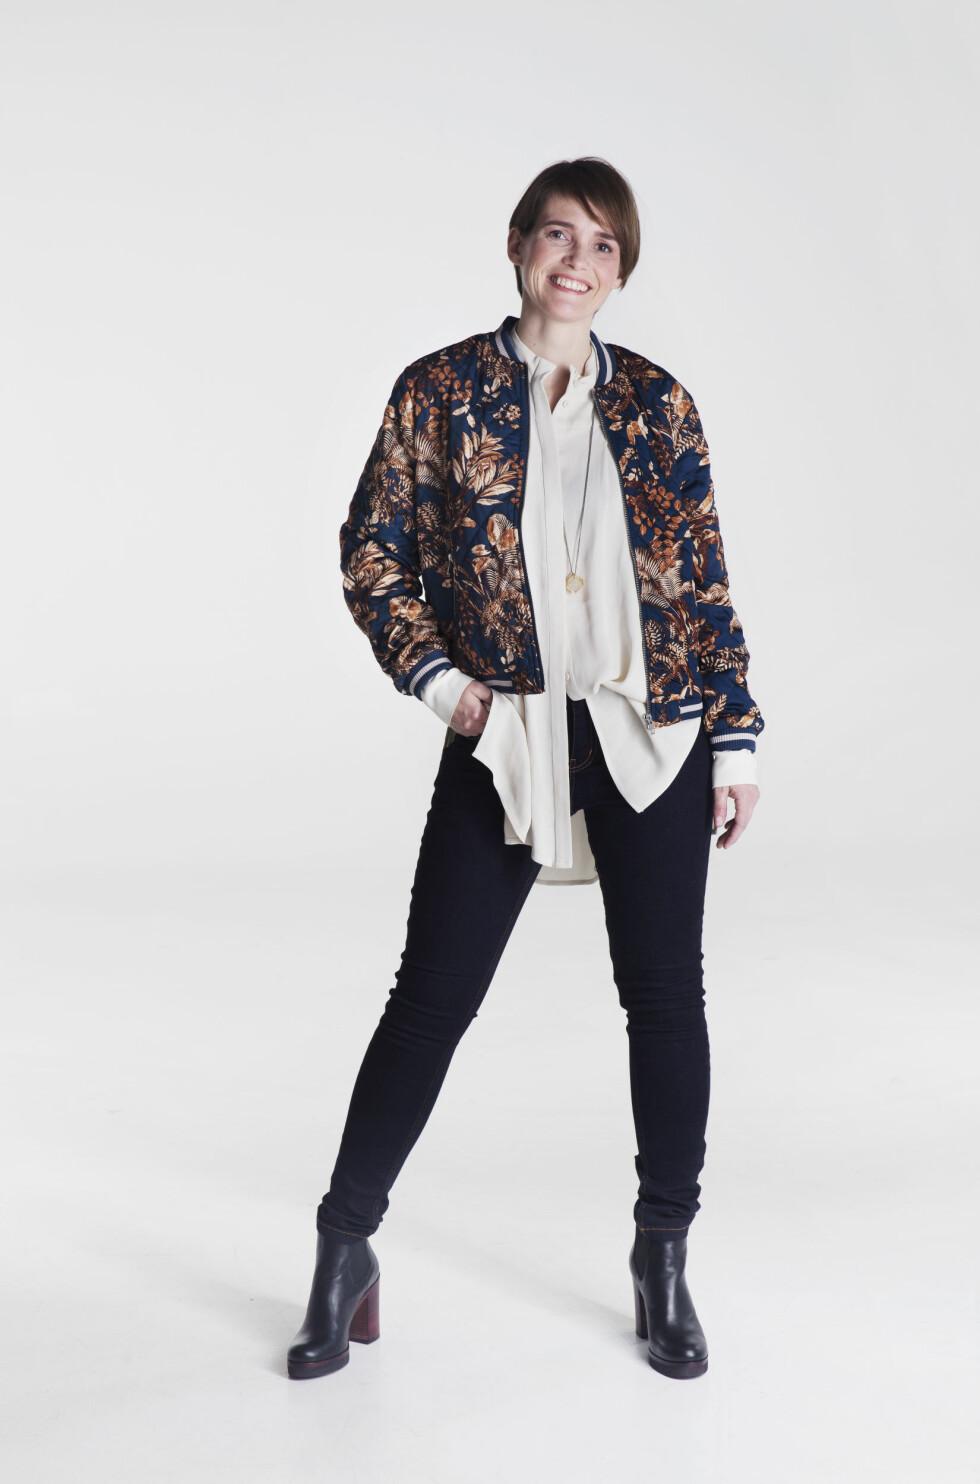 FEMININ STIL: Jakke (kr 1599, Gestuz/Walk-in Closet), bluse (kr 1299, Just Female/Walk-in Closet), jeans (kr 1199, Gestuz/Walk-in Closet), ankelstøvler (kr1799, Shoe + Shoe).  Foto: Yvonne Wilhelmsen